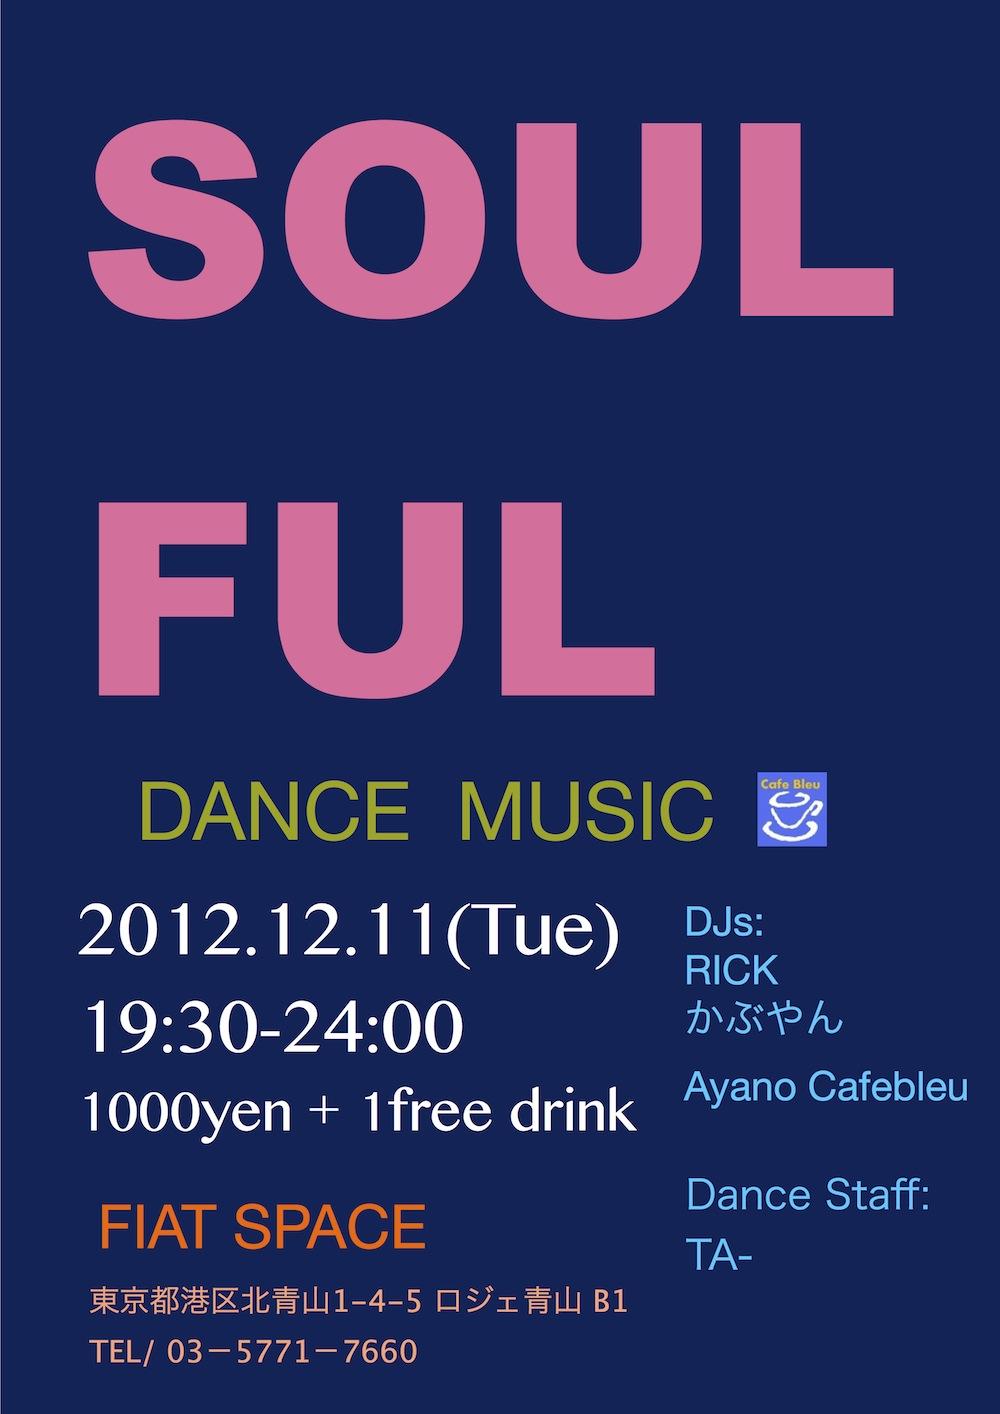 soulful20121211.jpg